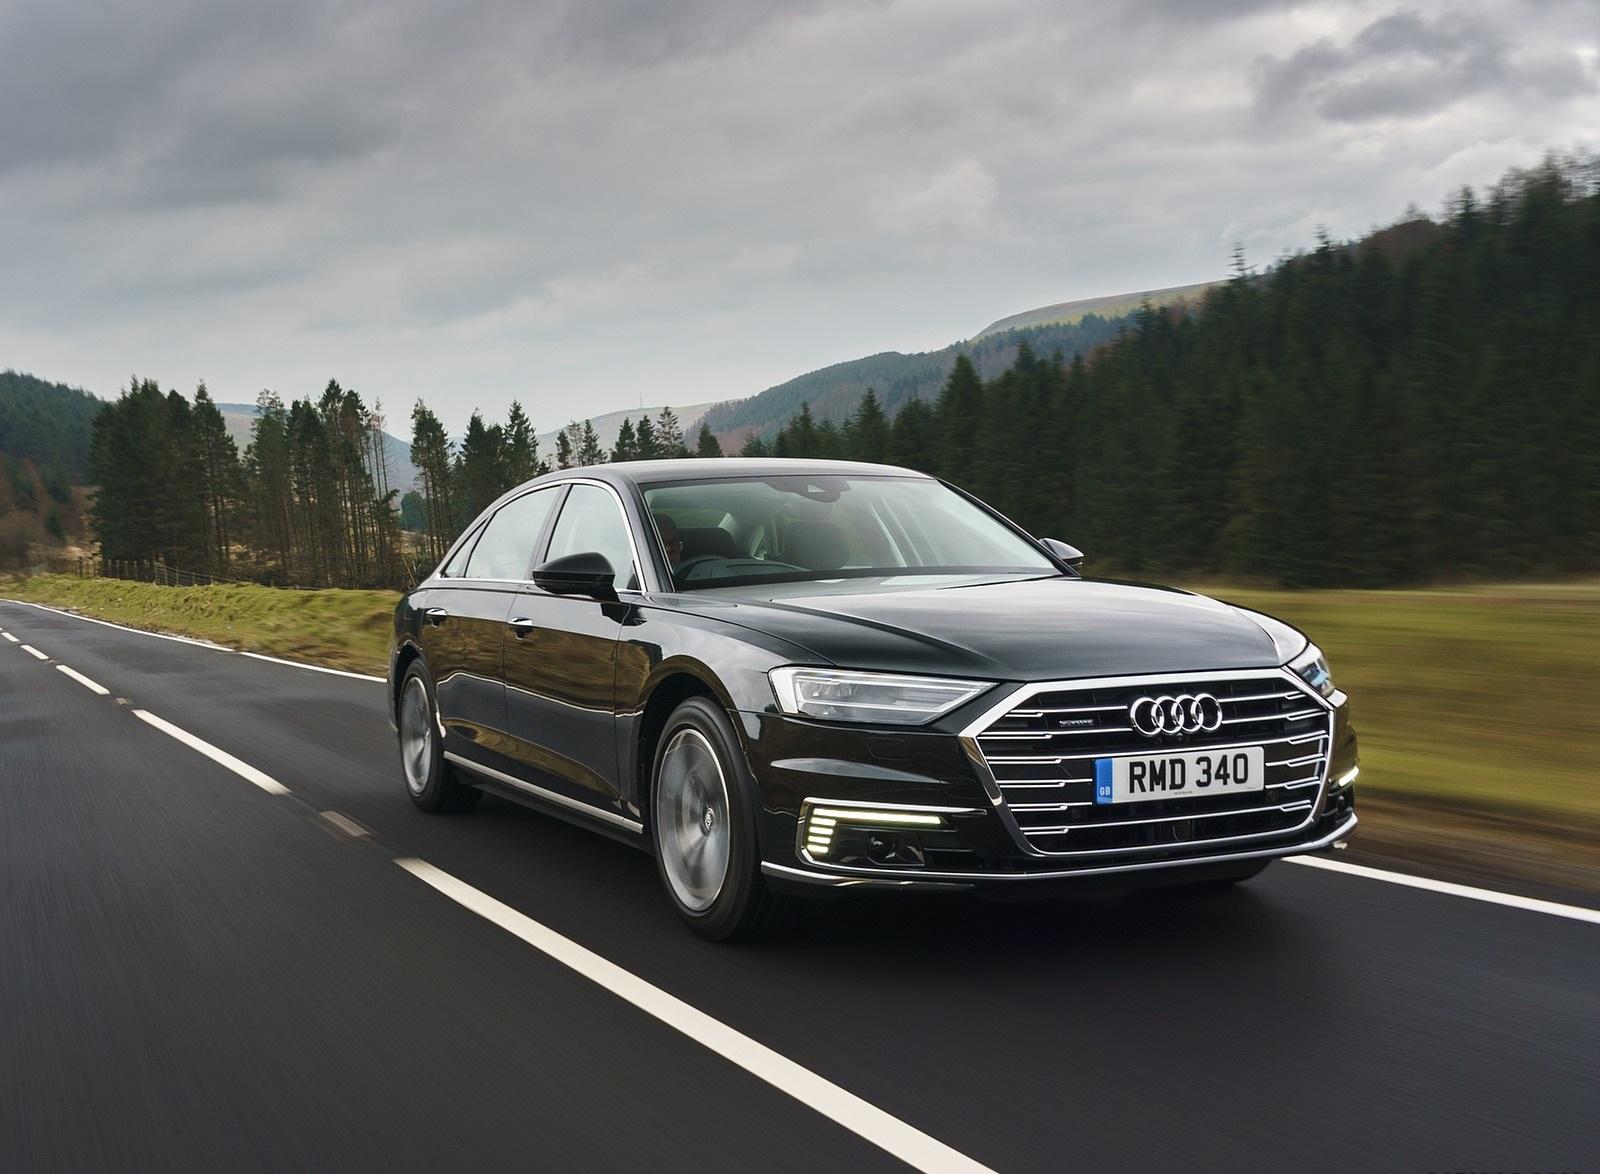 2020 Audi A8 L 60 TFSI e quattro (Plug-In Hybrid UK-Spec) Front Three-Quarter Wallpapers (8)